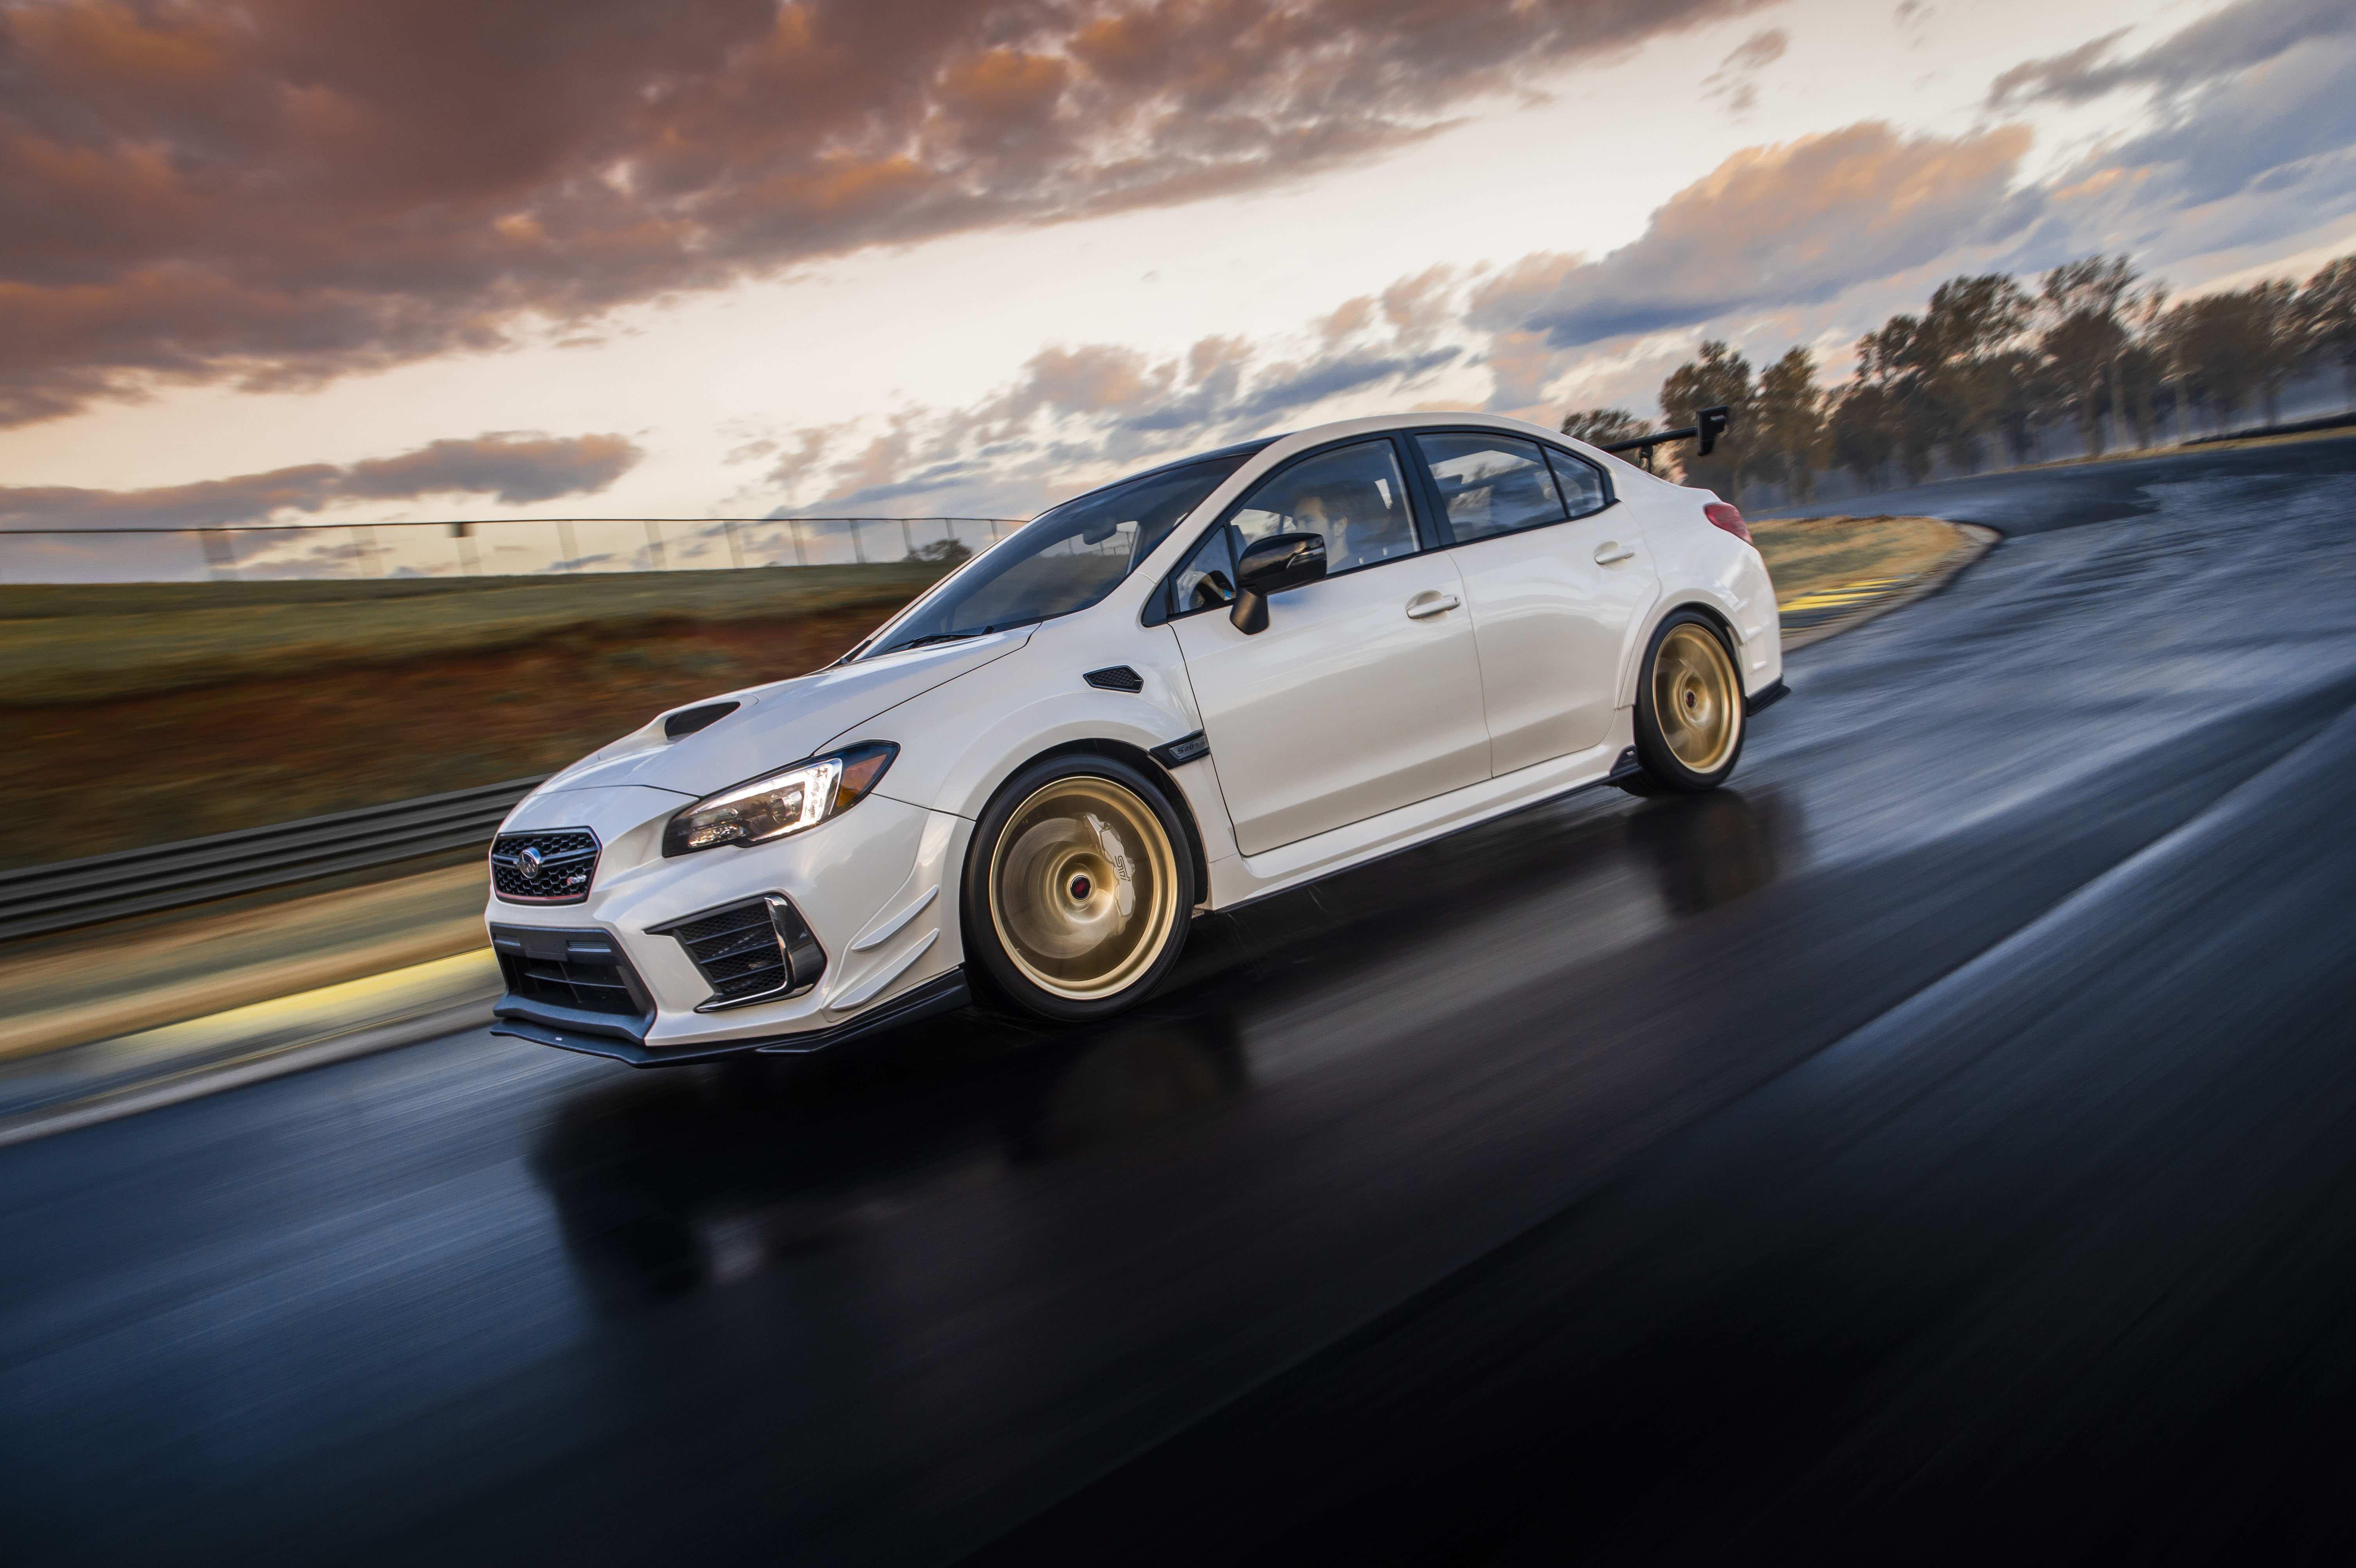 66 New 2020 Subaru Wrx Sti Specs Release Date by 2020 Subaru